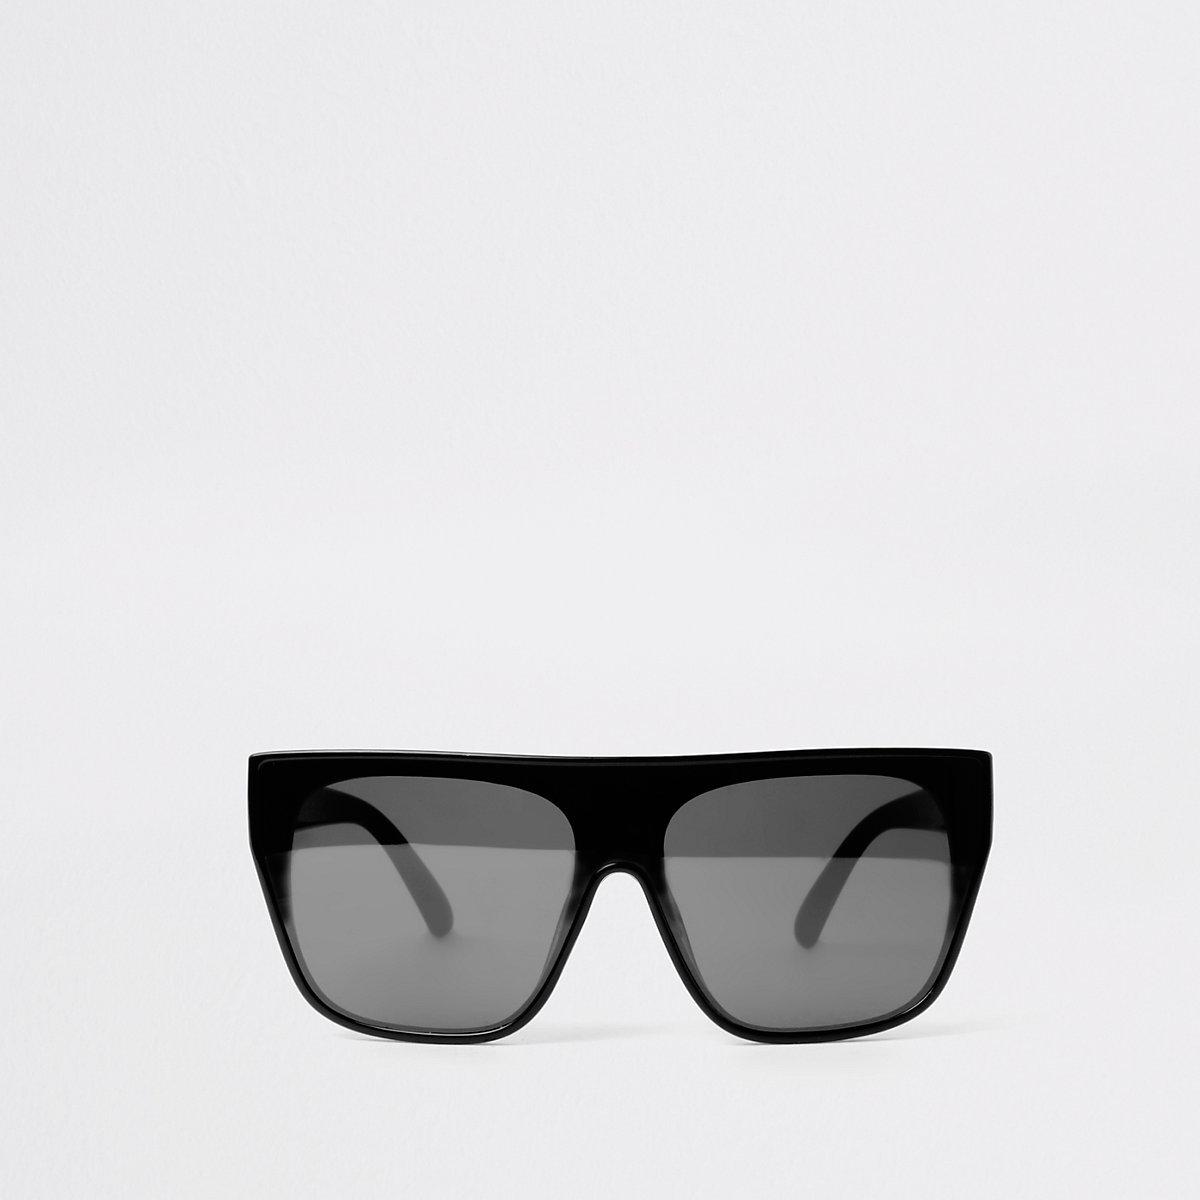 Black visor smoke lens sunglasses